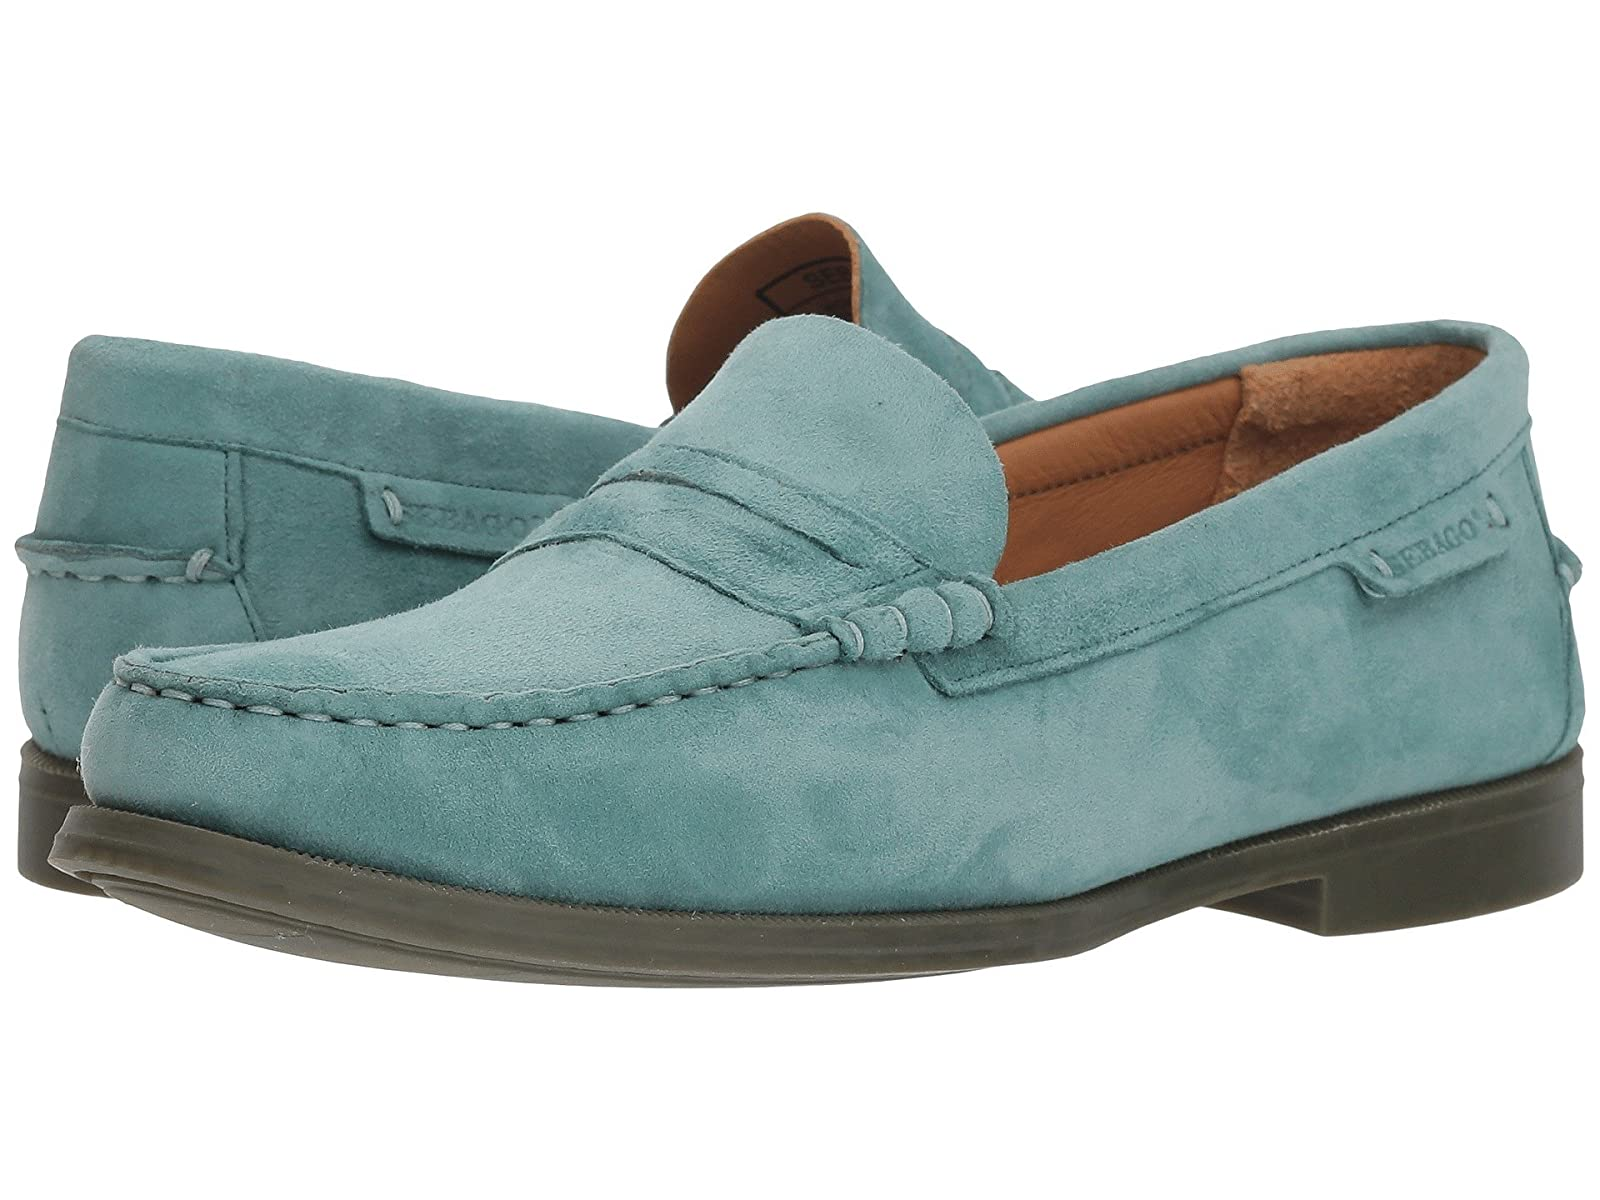 Sebago Plaza IIAtmospheric grades have affordable shoes